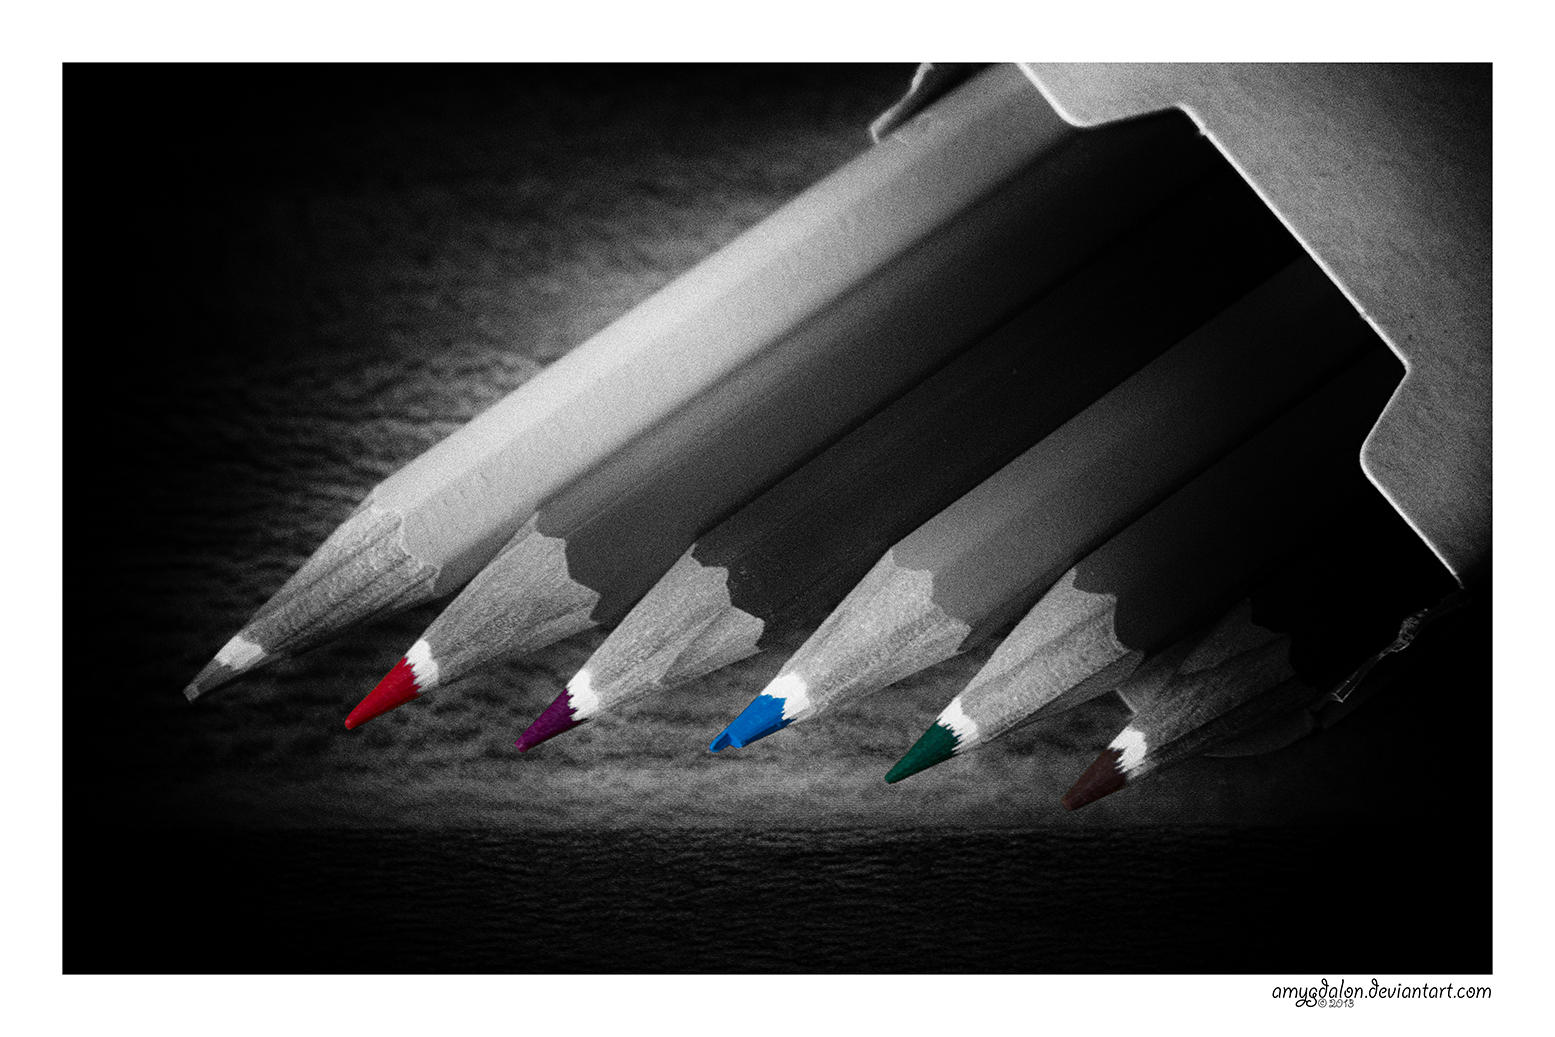 .: the missing colour :. by amygdalon